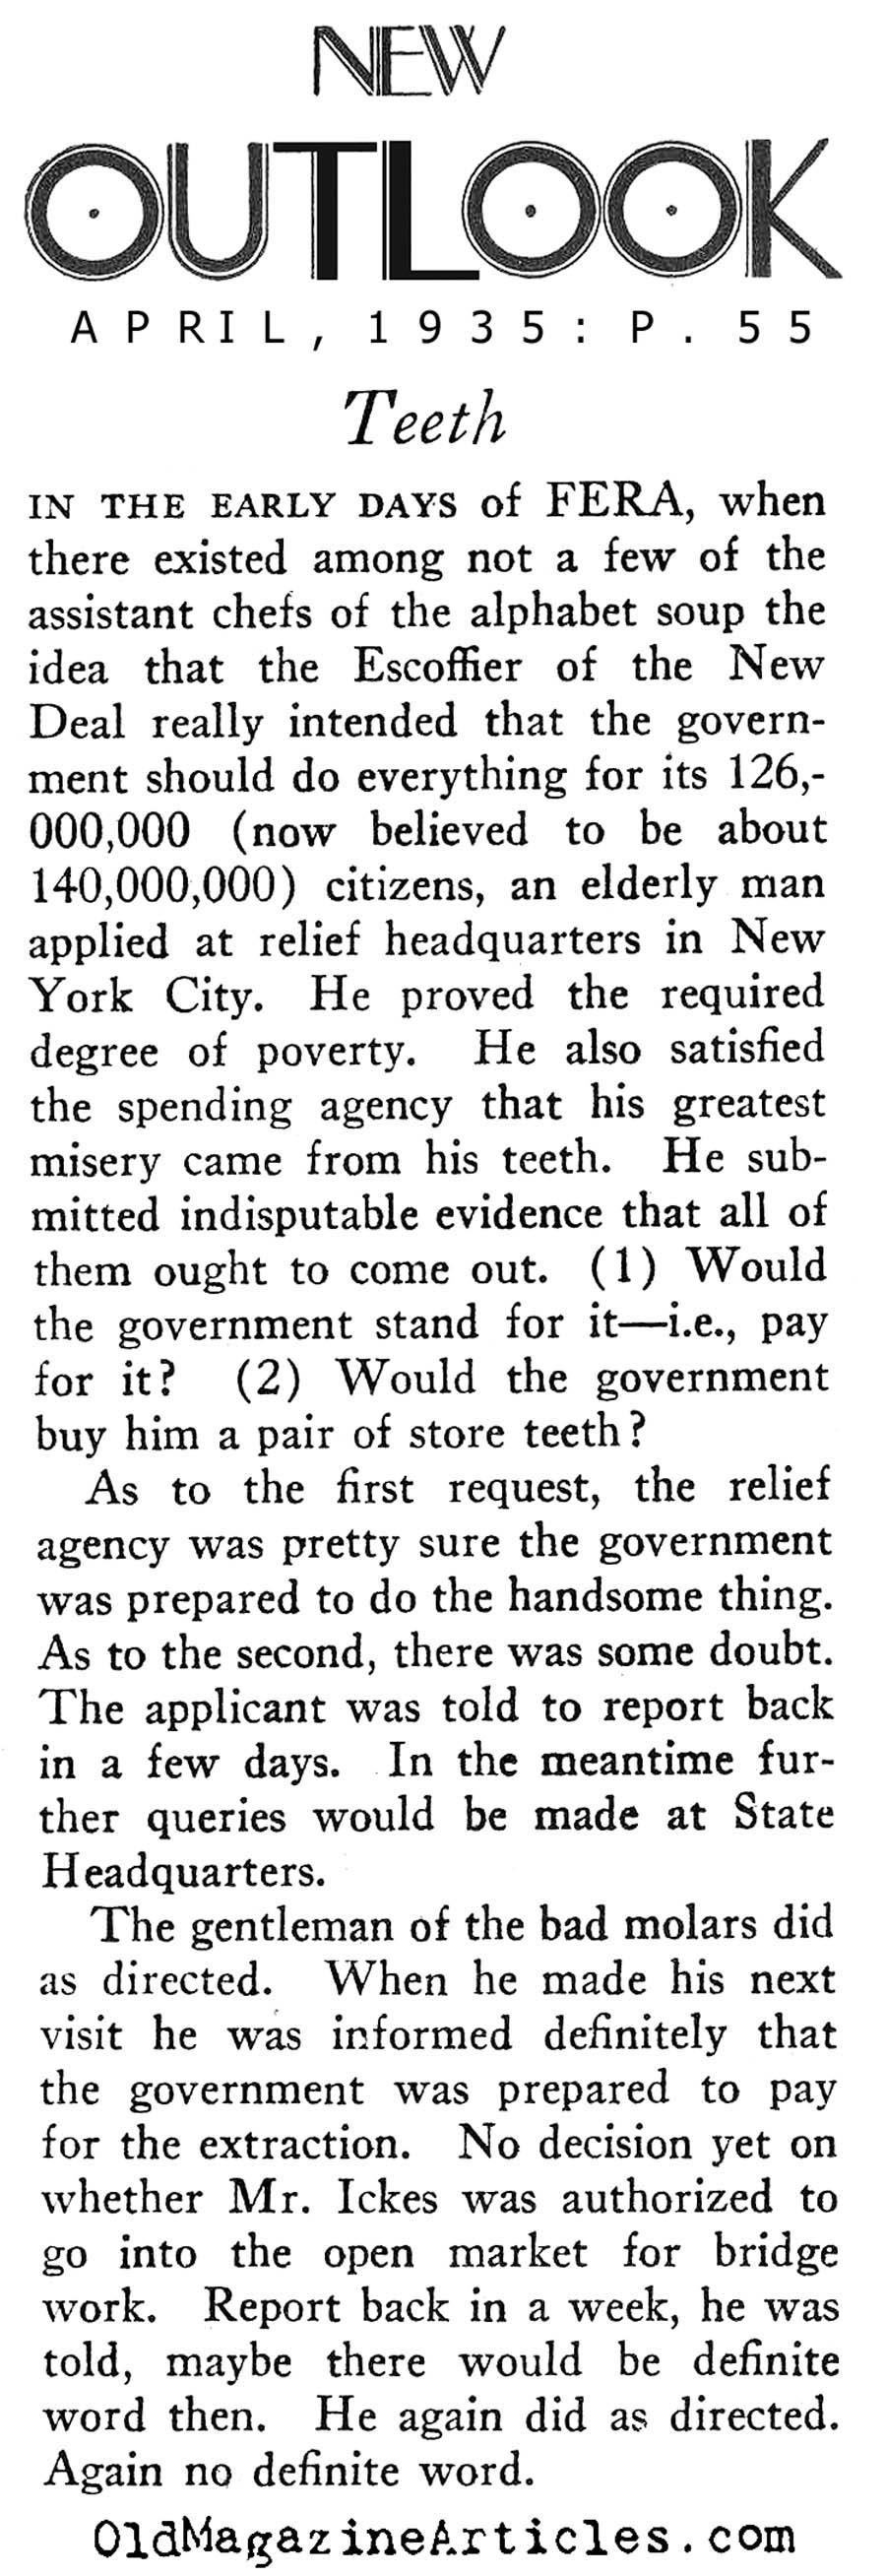 NEW DEAL ANECDOTE 1935 | FERA AGENCY HISTORY | SOCIALIZED MEDICINE